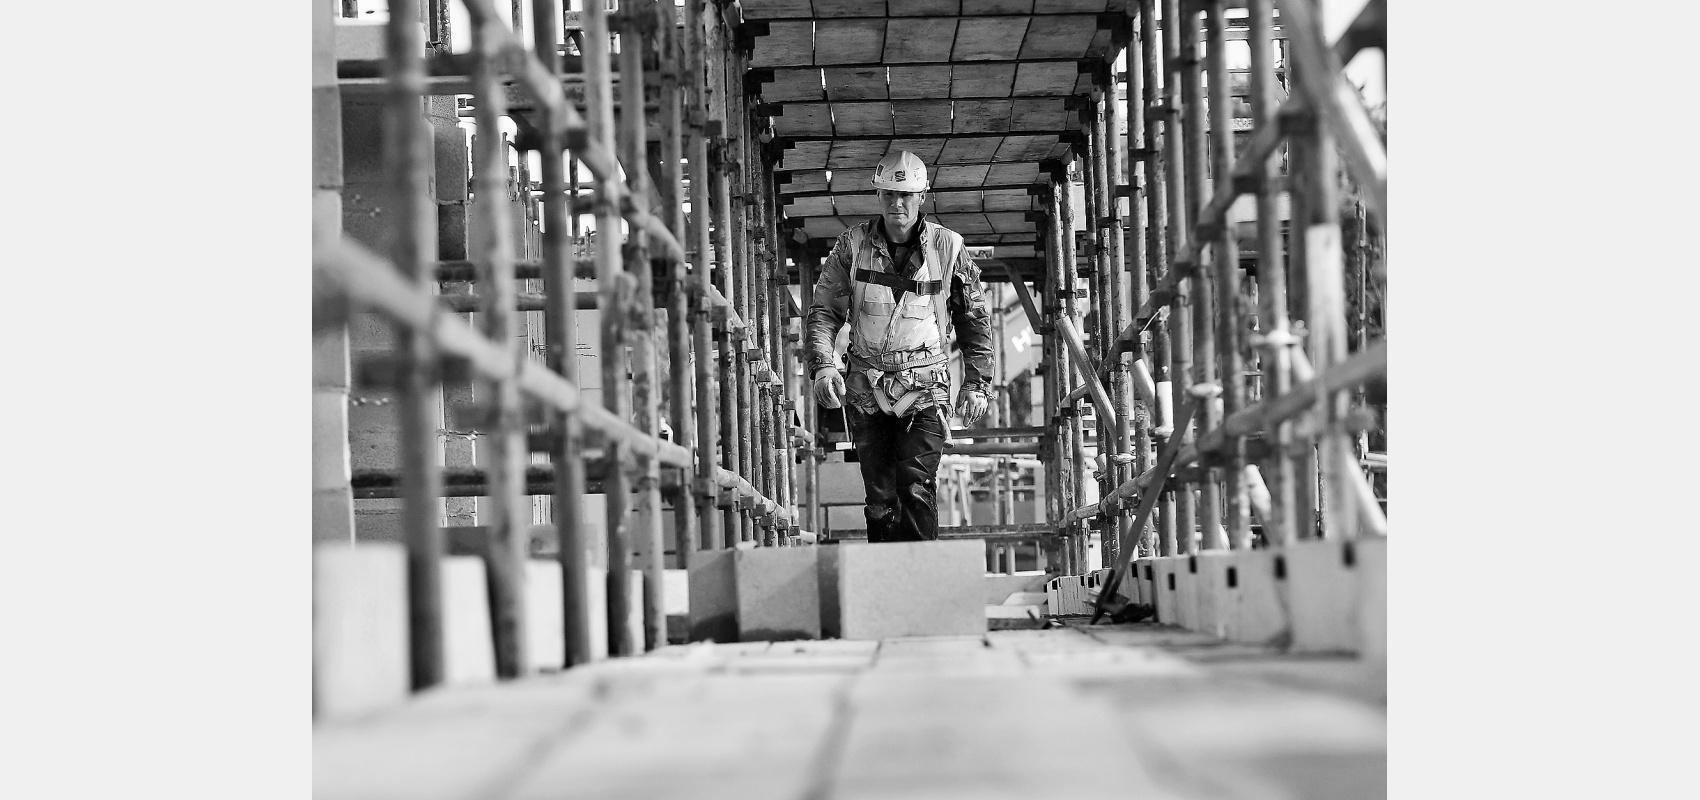 Construction worker - Steeplejack on gantry.Black & white, image